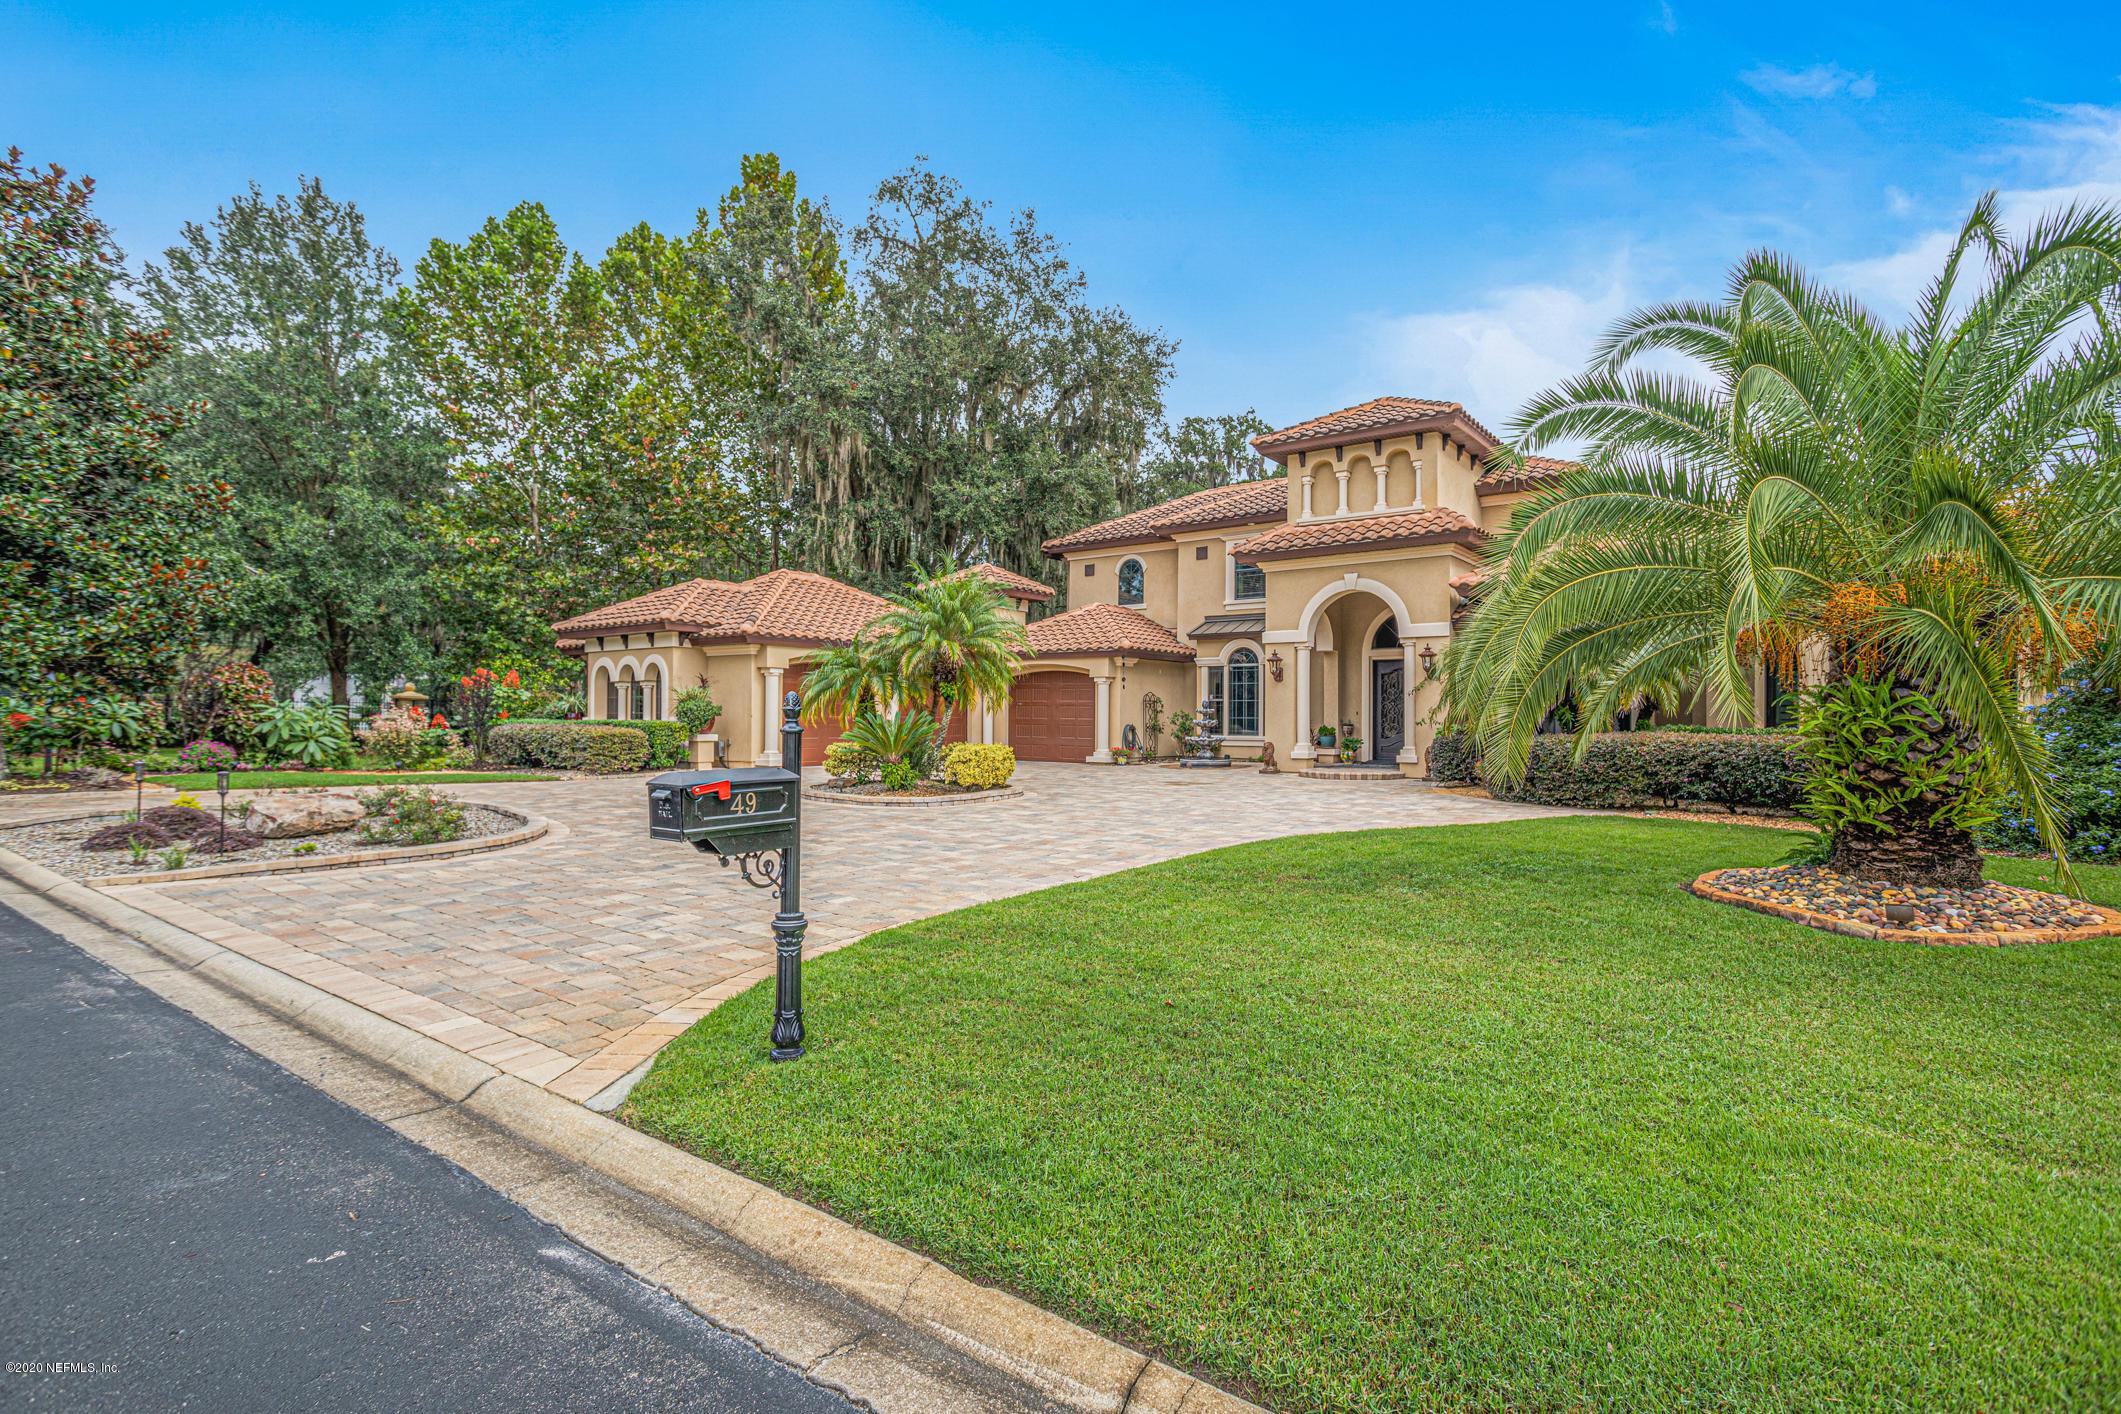 Details for 49 Villa Sovana Ct, ST JOHNS, FL 32259